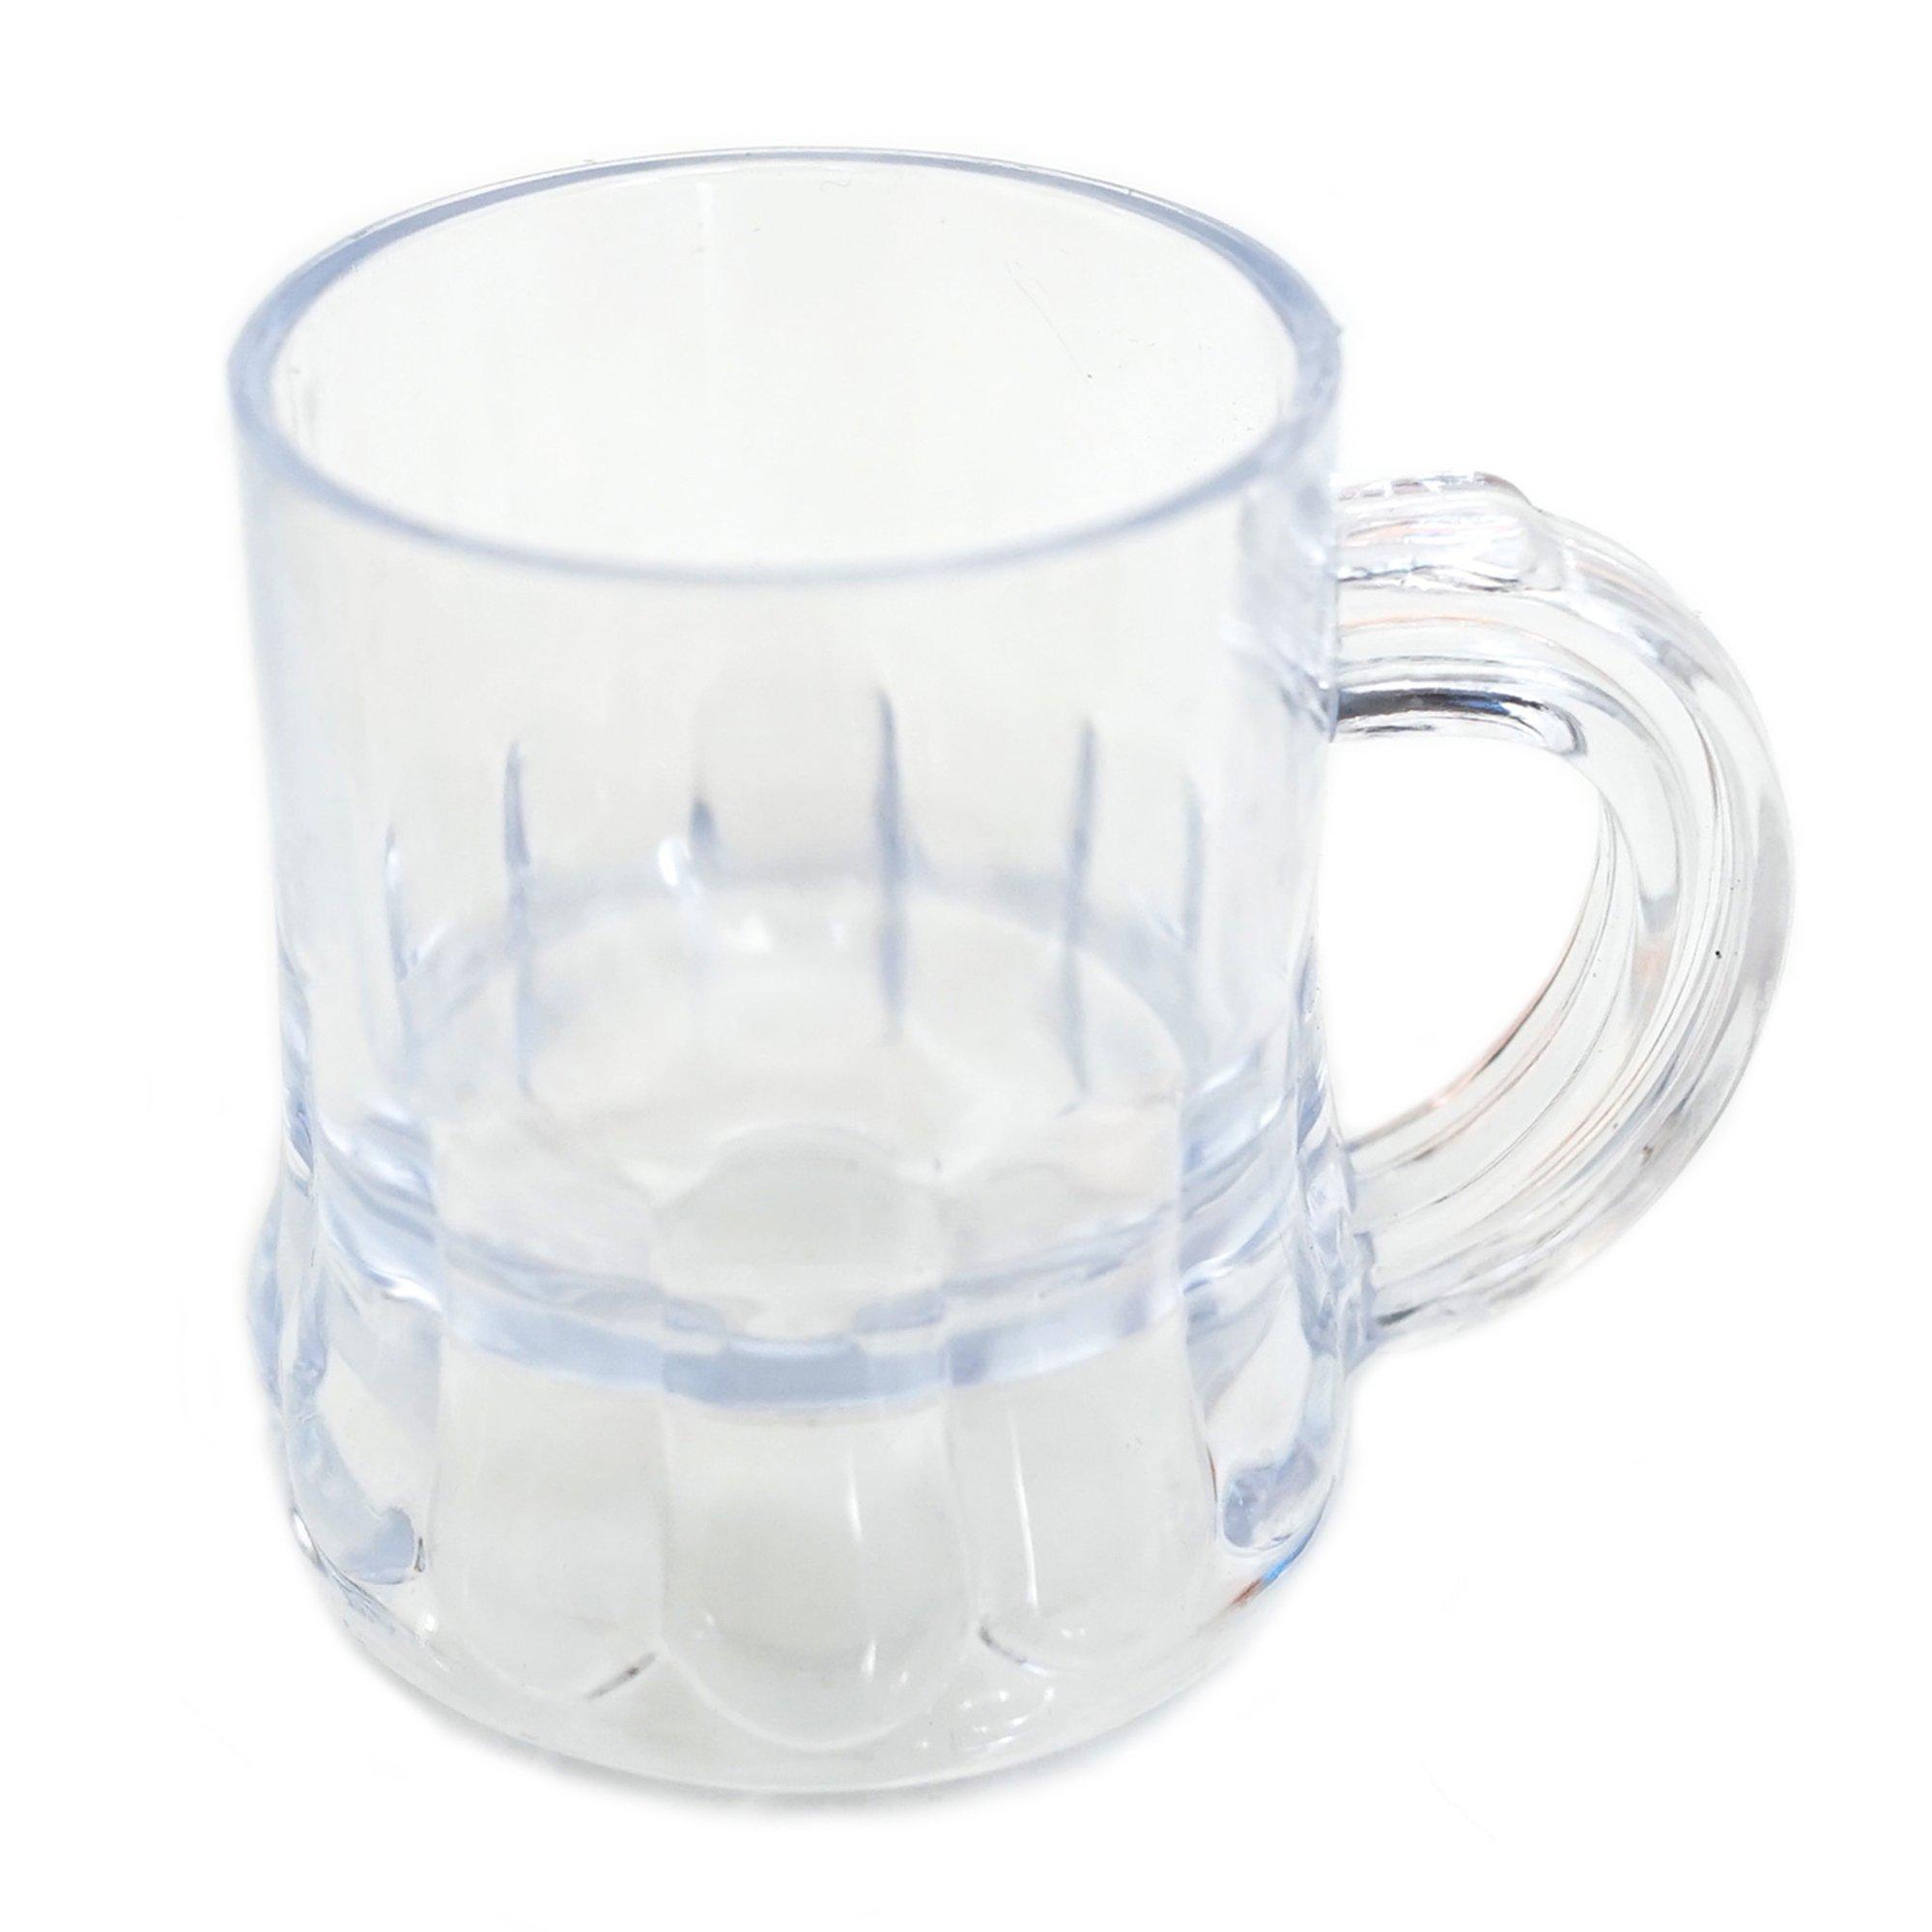 Mini Clear Plastic Beer Mug Shot Glasses- 1.75'' Tall - (12 Count)